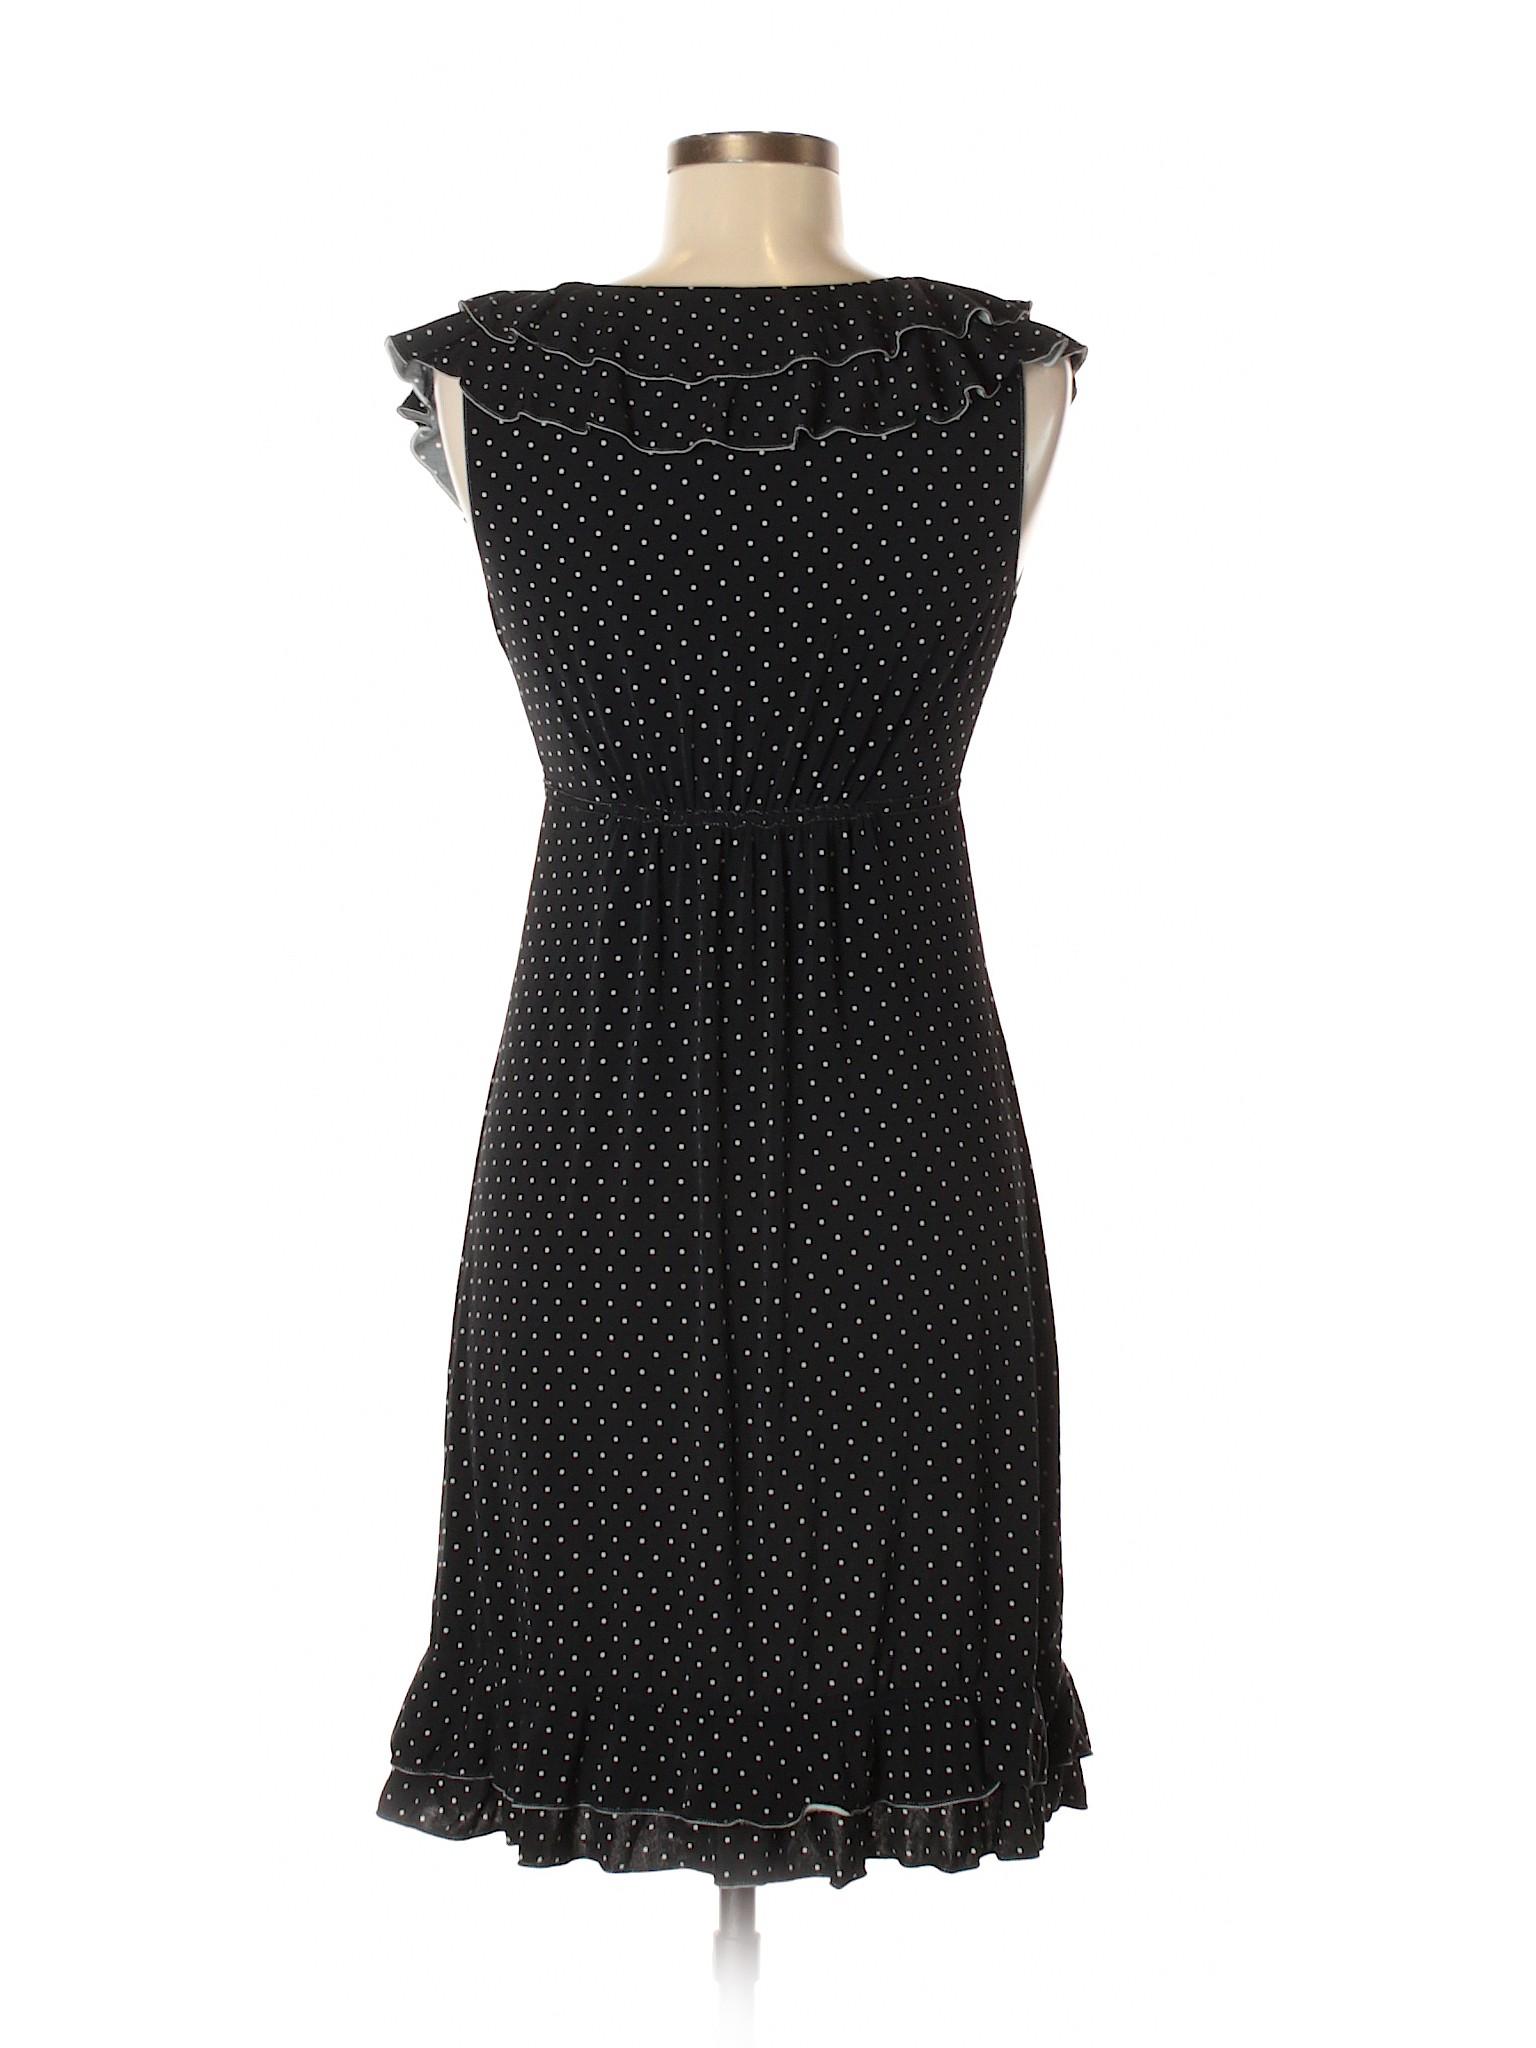 Boutique winter Casual Max Studio Dress rrpYRqw